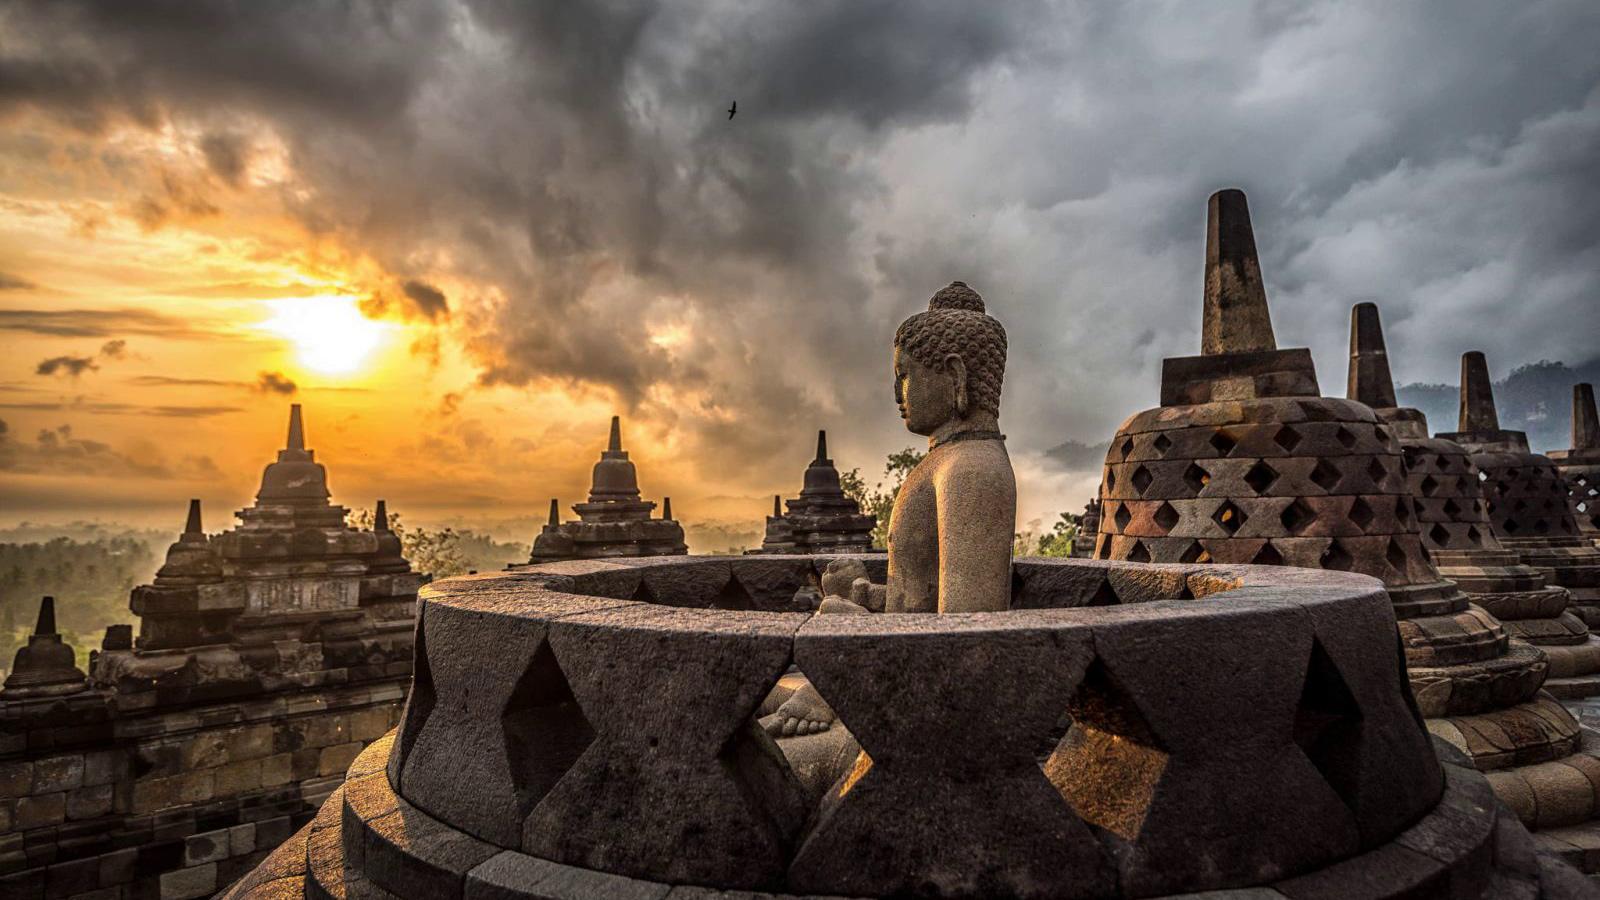 Wisata Candi Borobudur Magelang Jawa Tengah Duaistanto Journey